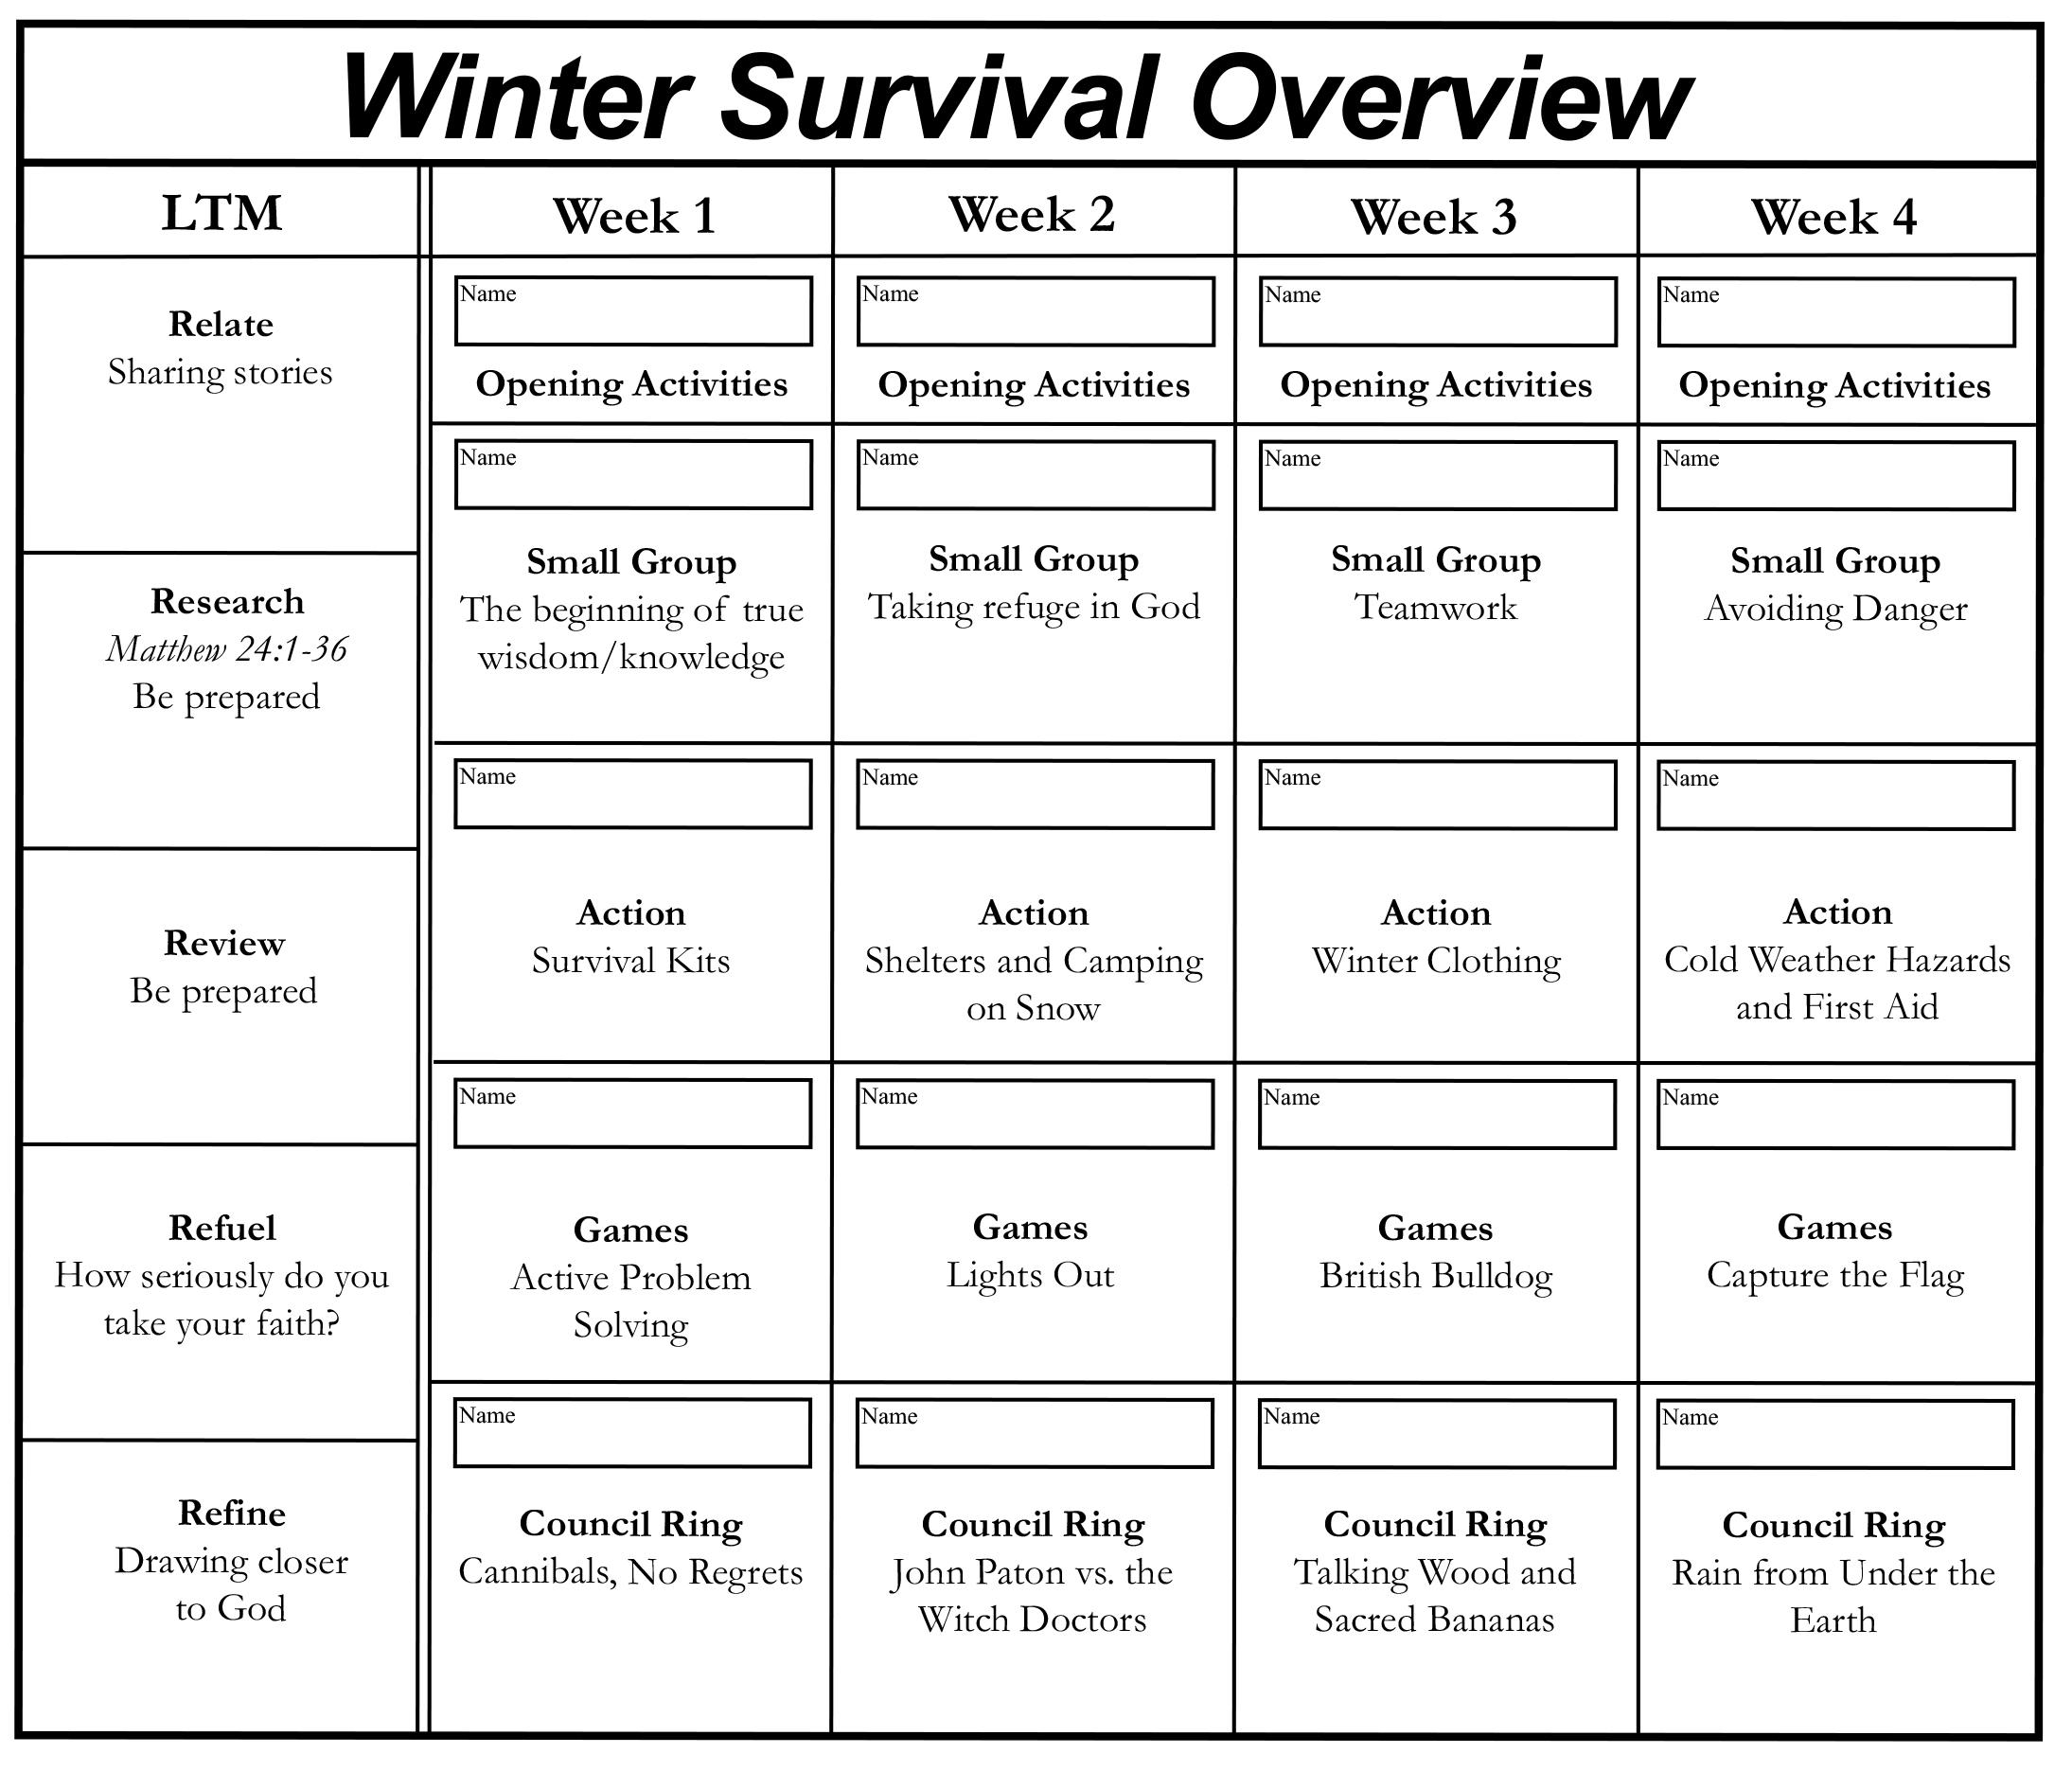 winter-survival-overview.jpg